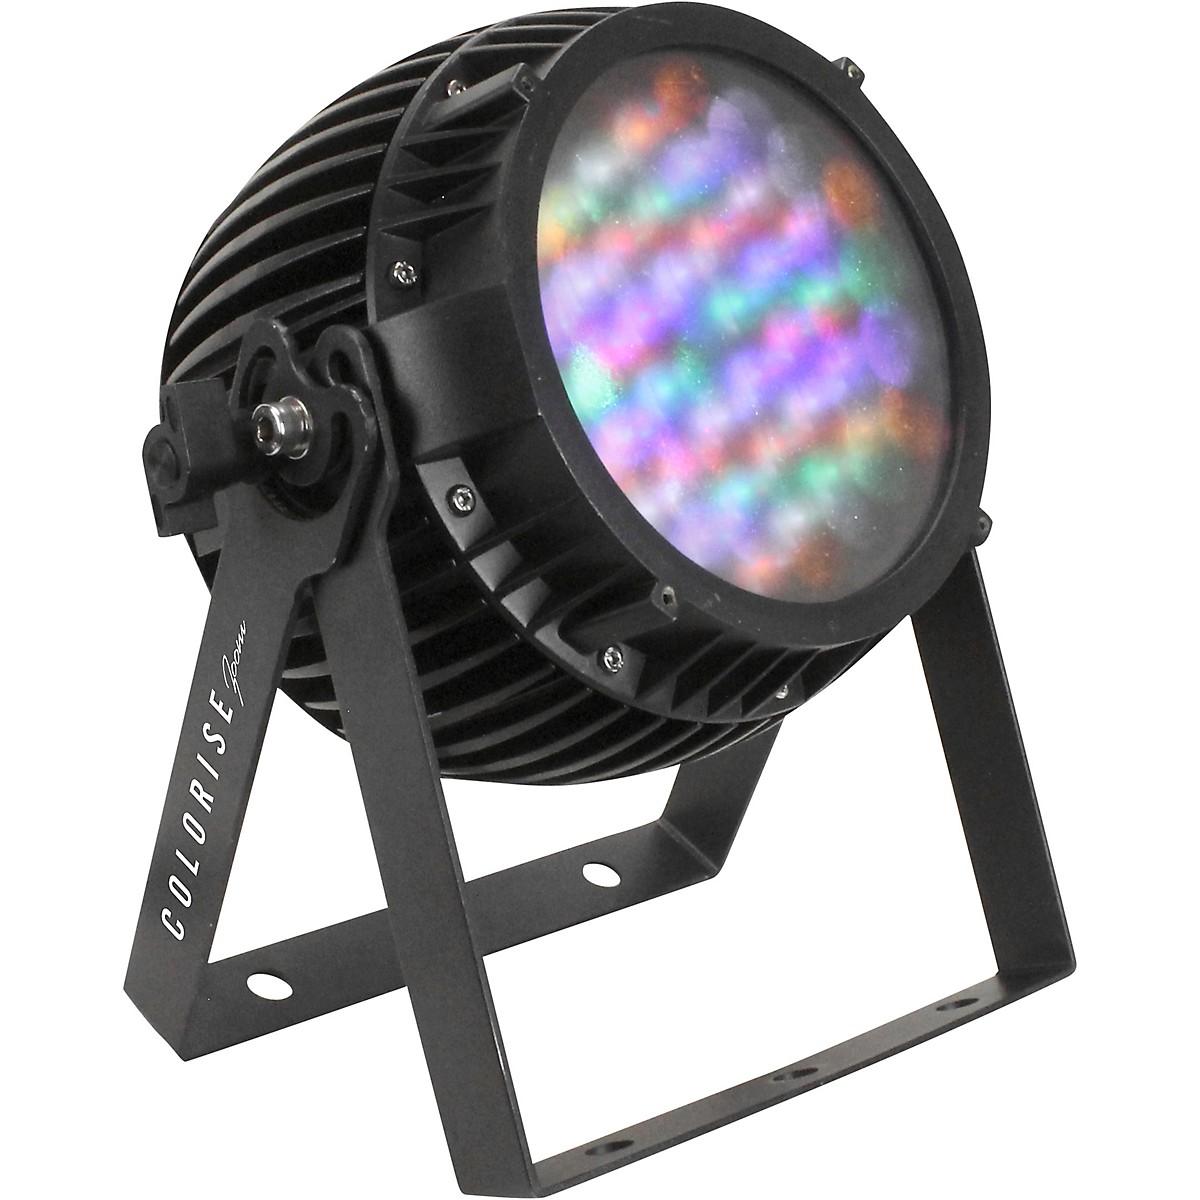 Blizzard Colorise Zoom RGBAW LED PAR Wash Light with Wireless DMX